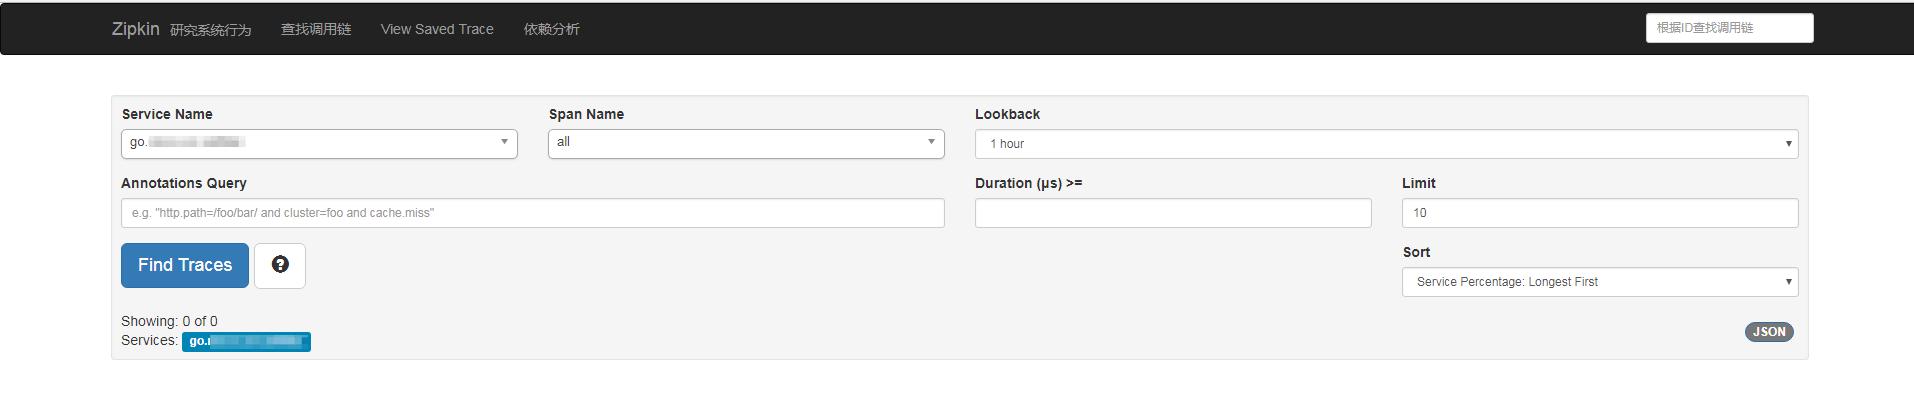 zipkin的安装与搭建| Linux运维笔记